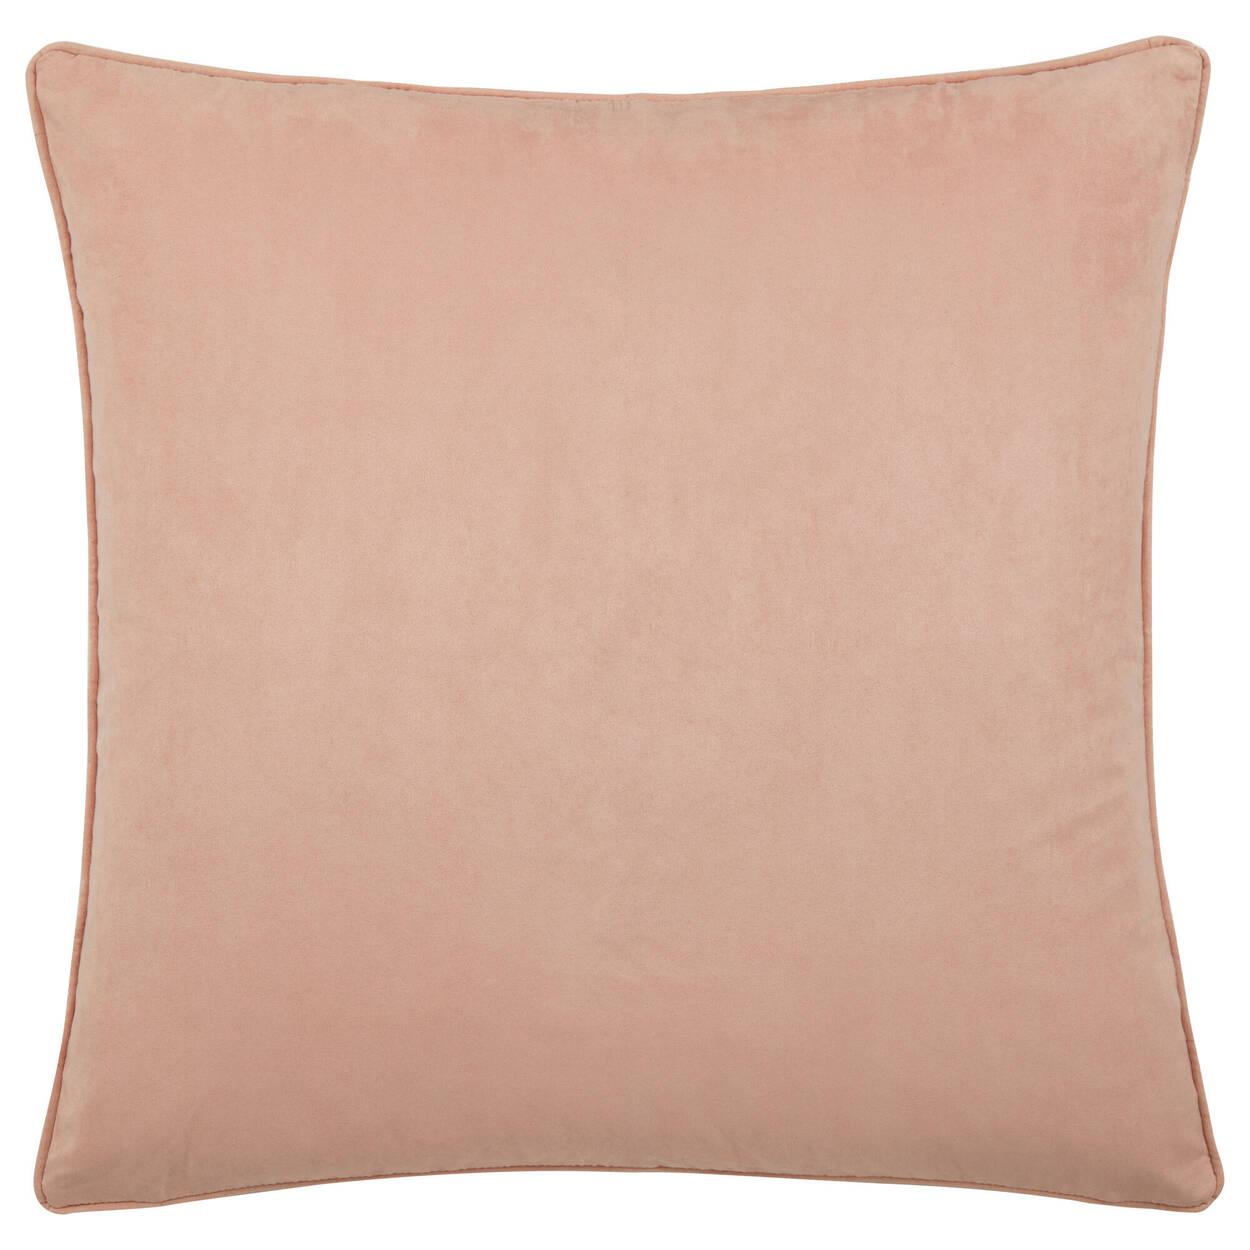 "Clifford Decorative Pillow 20"" x 20"""